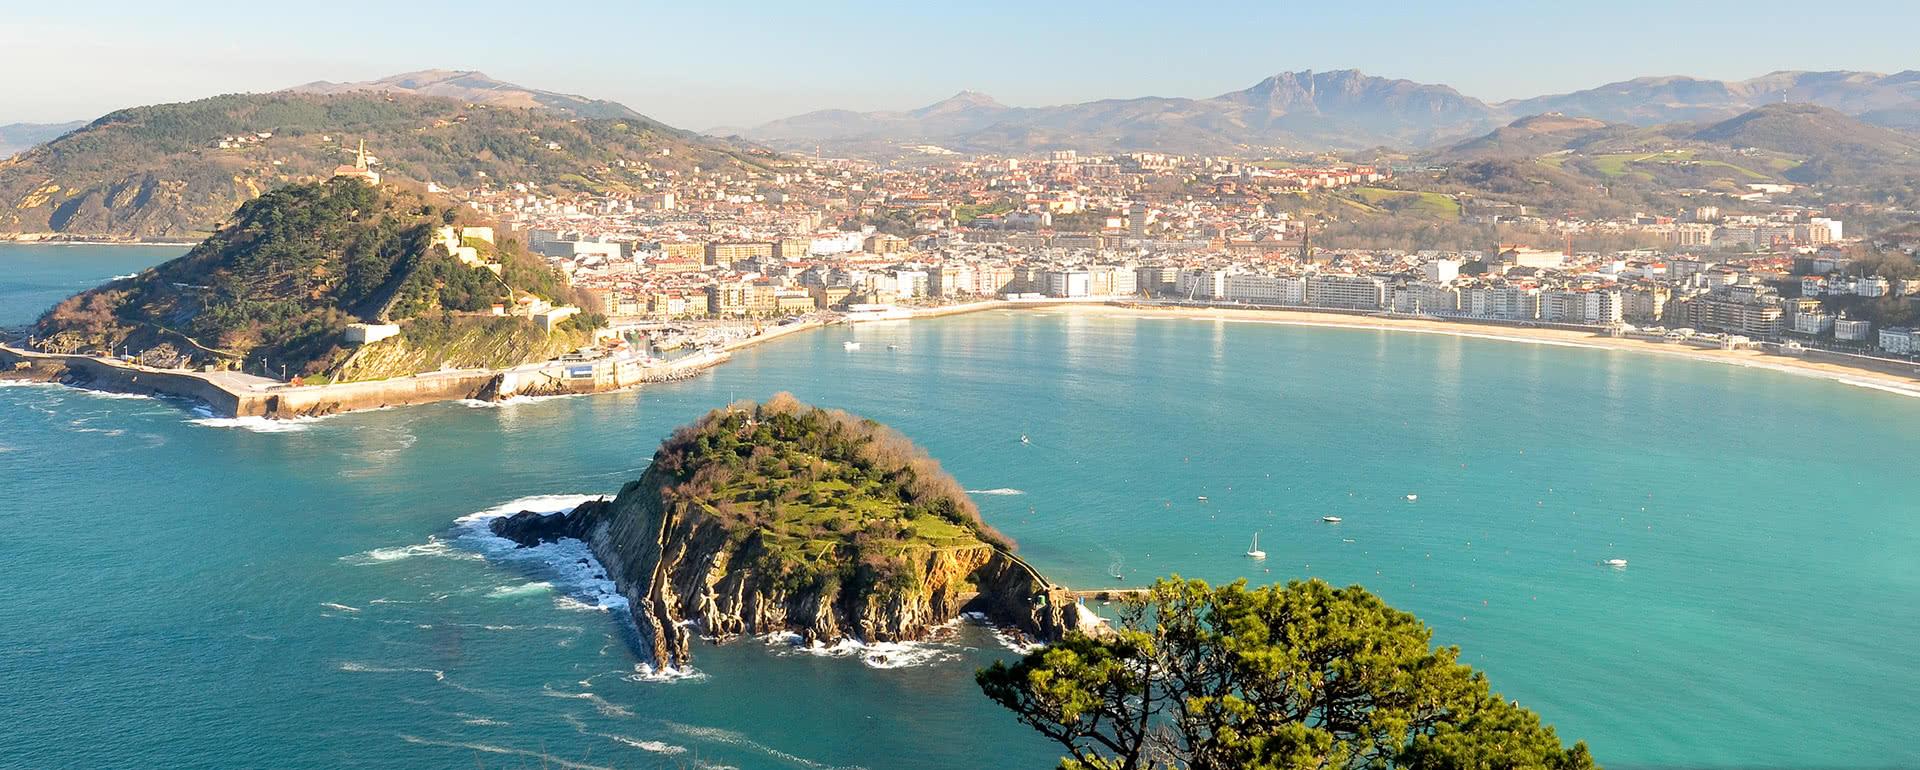 Titelbild von Donostia-San Sebastián